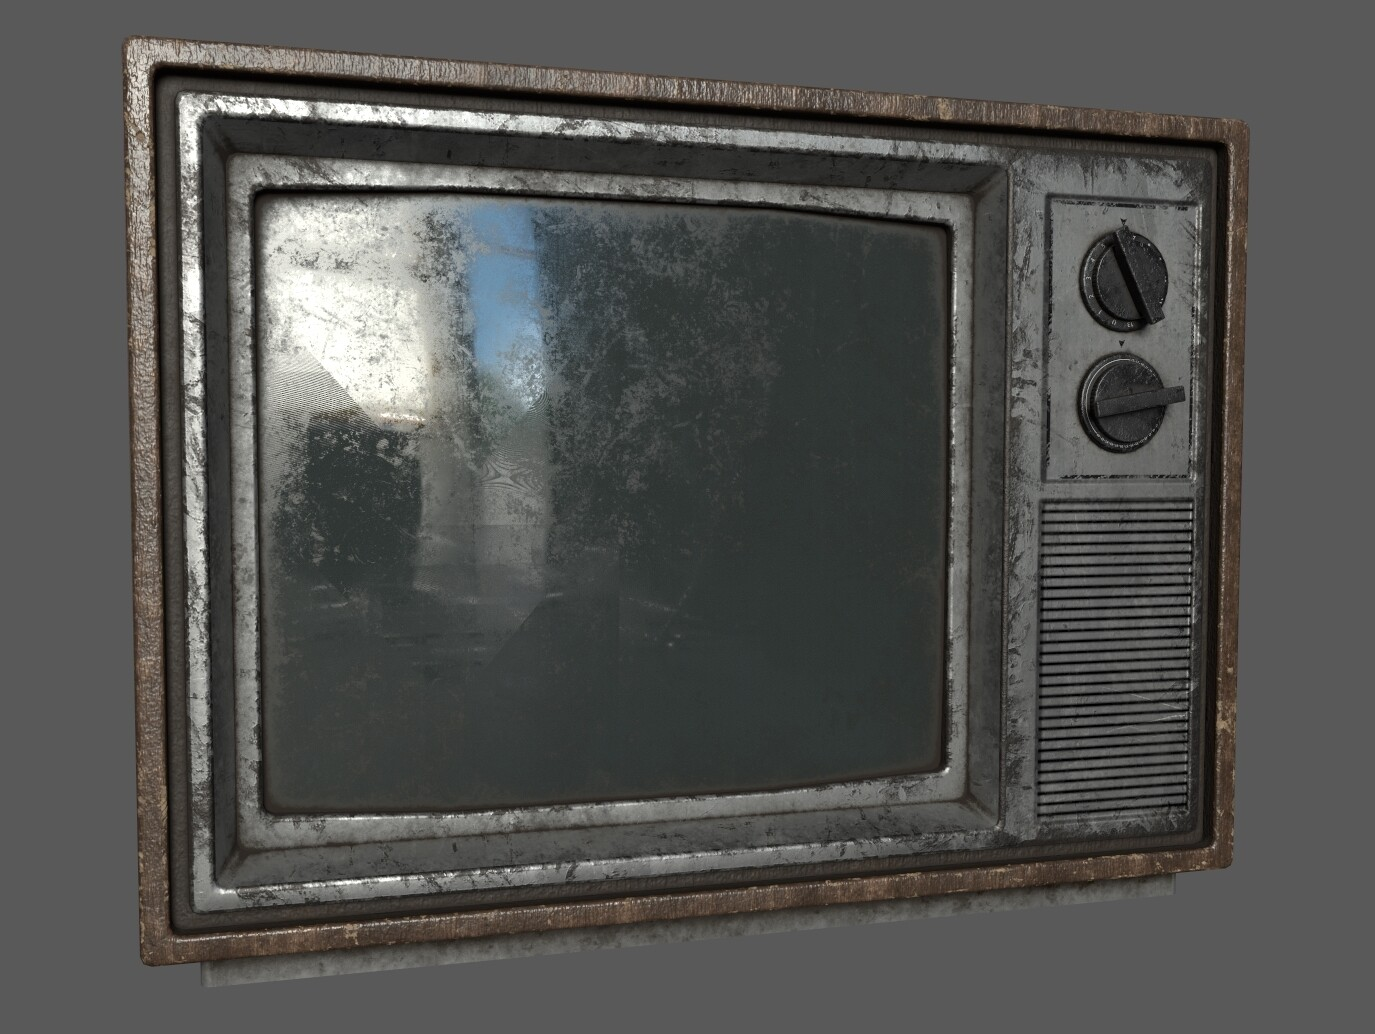 Television (Living Room Scene)